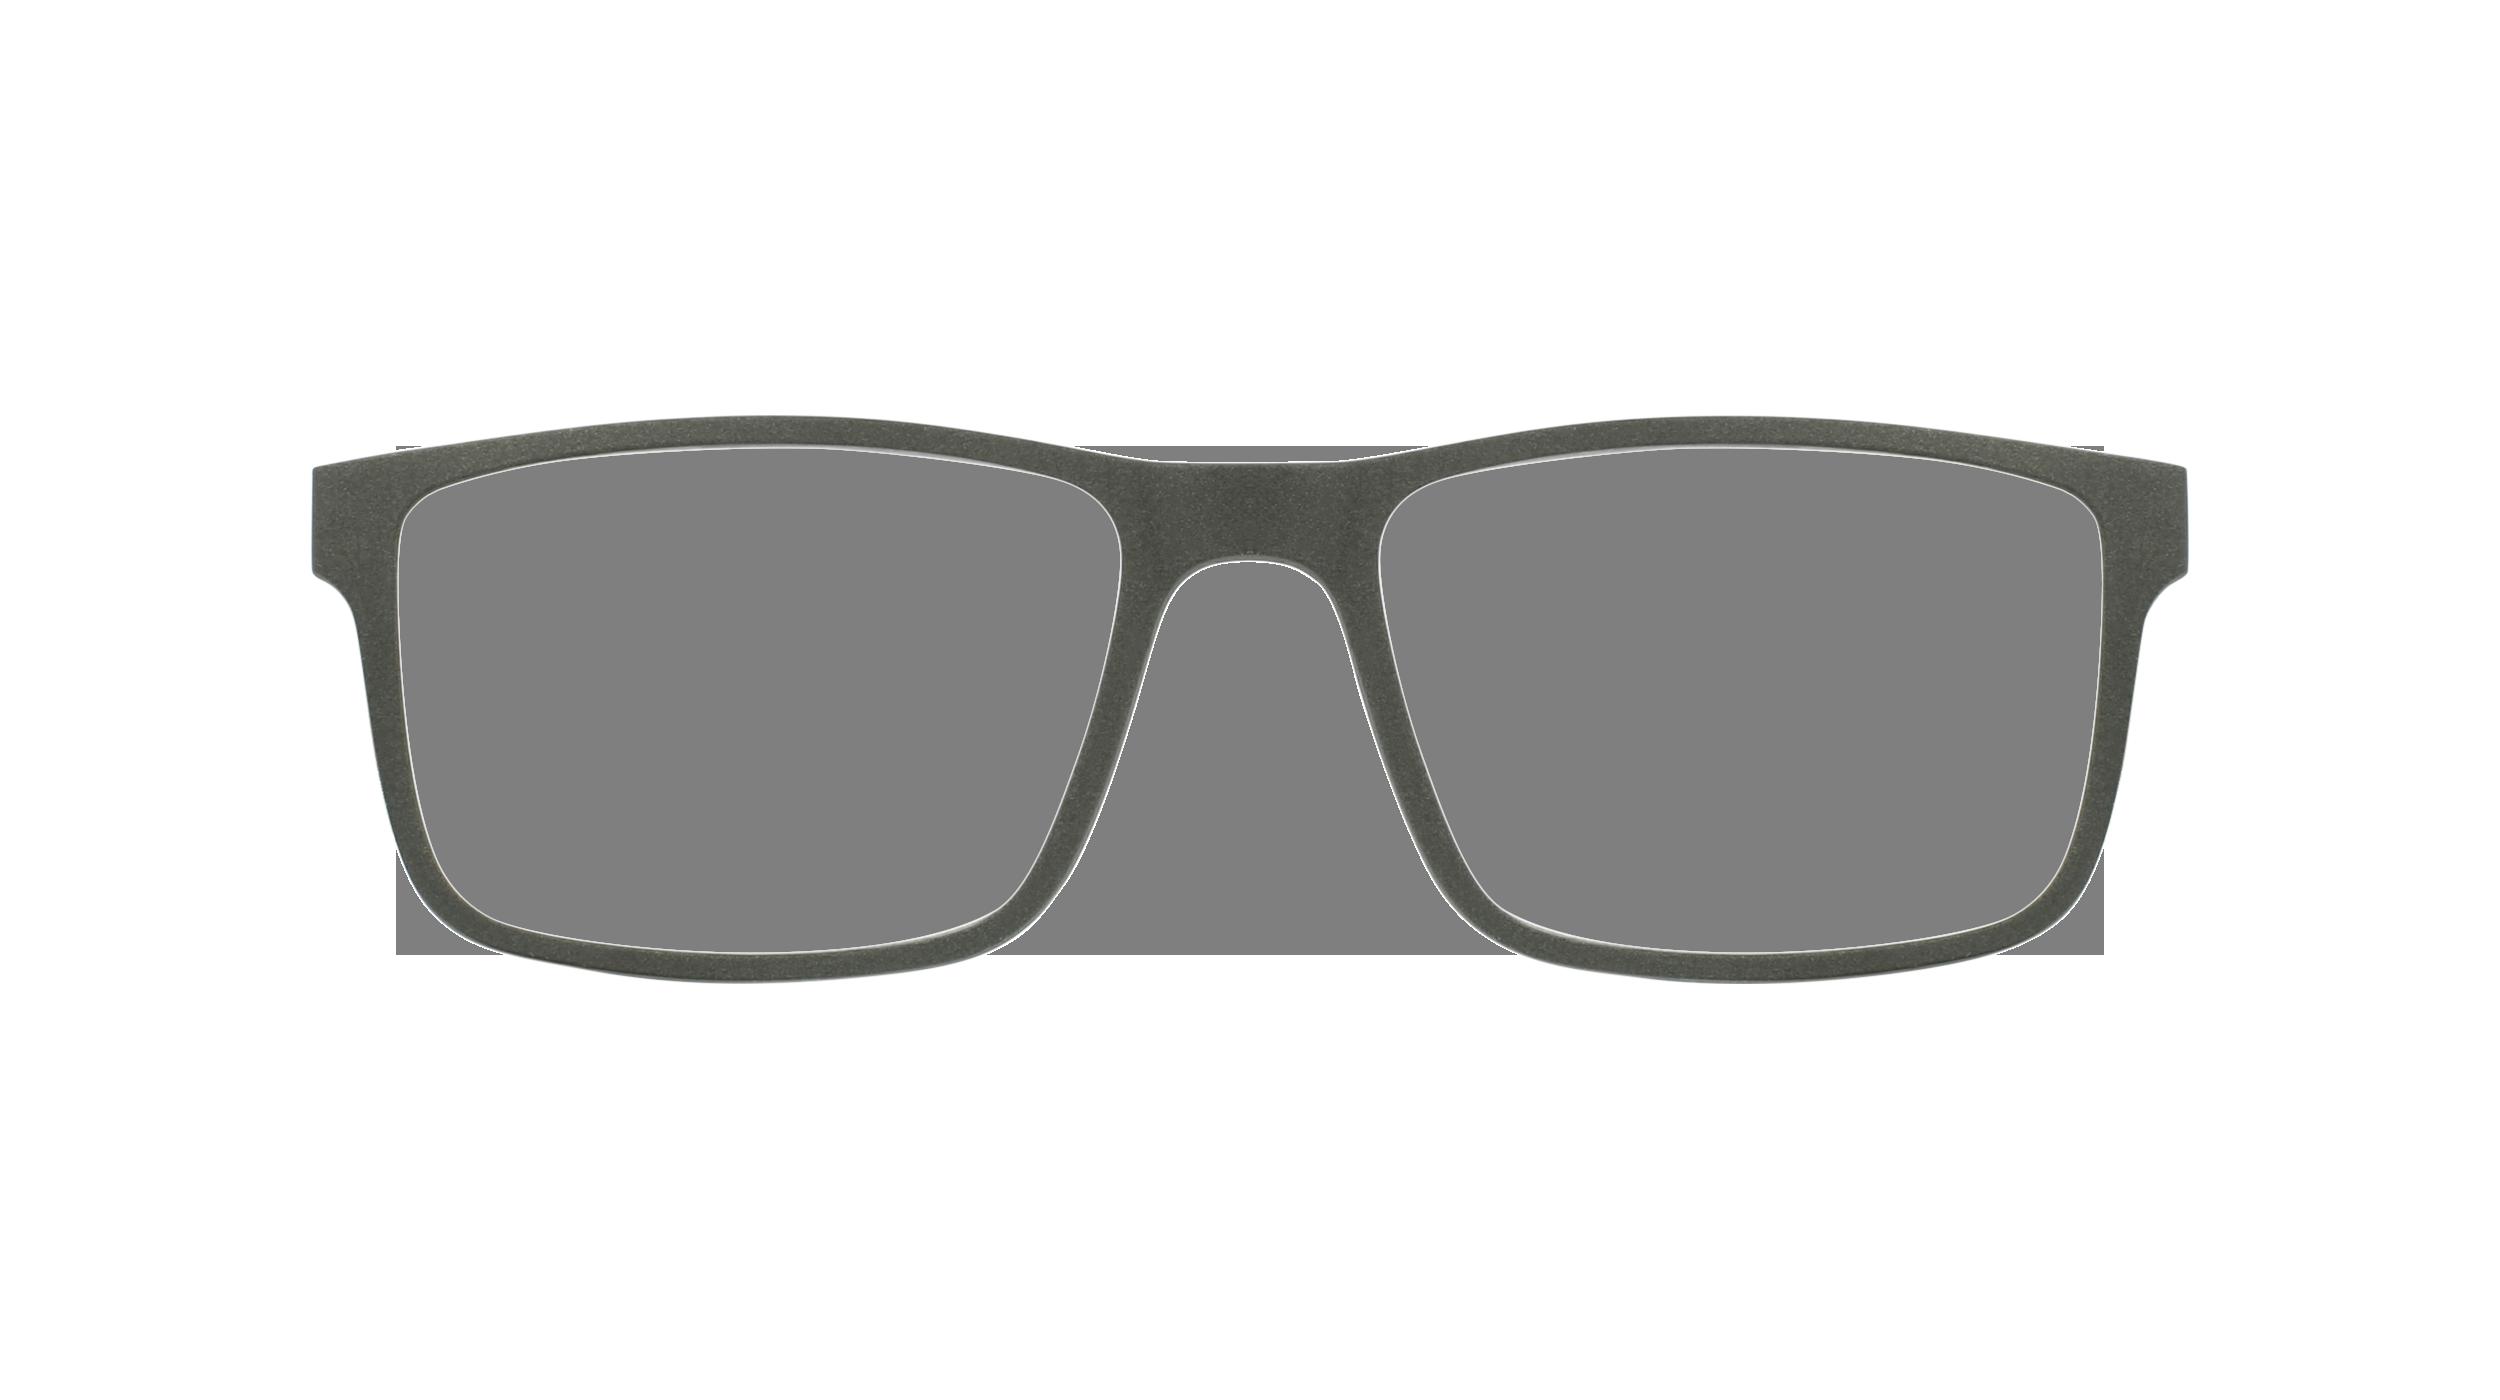 afflelou/france/products/smart_clip/clips_glasses/07630036457511.png